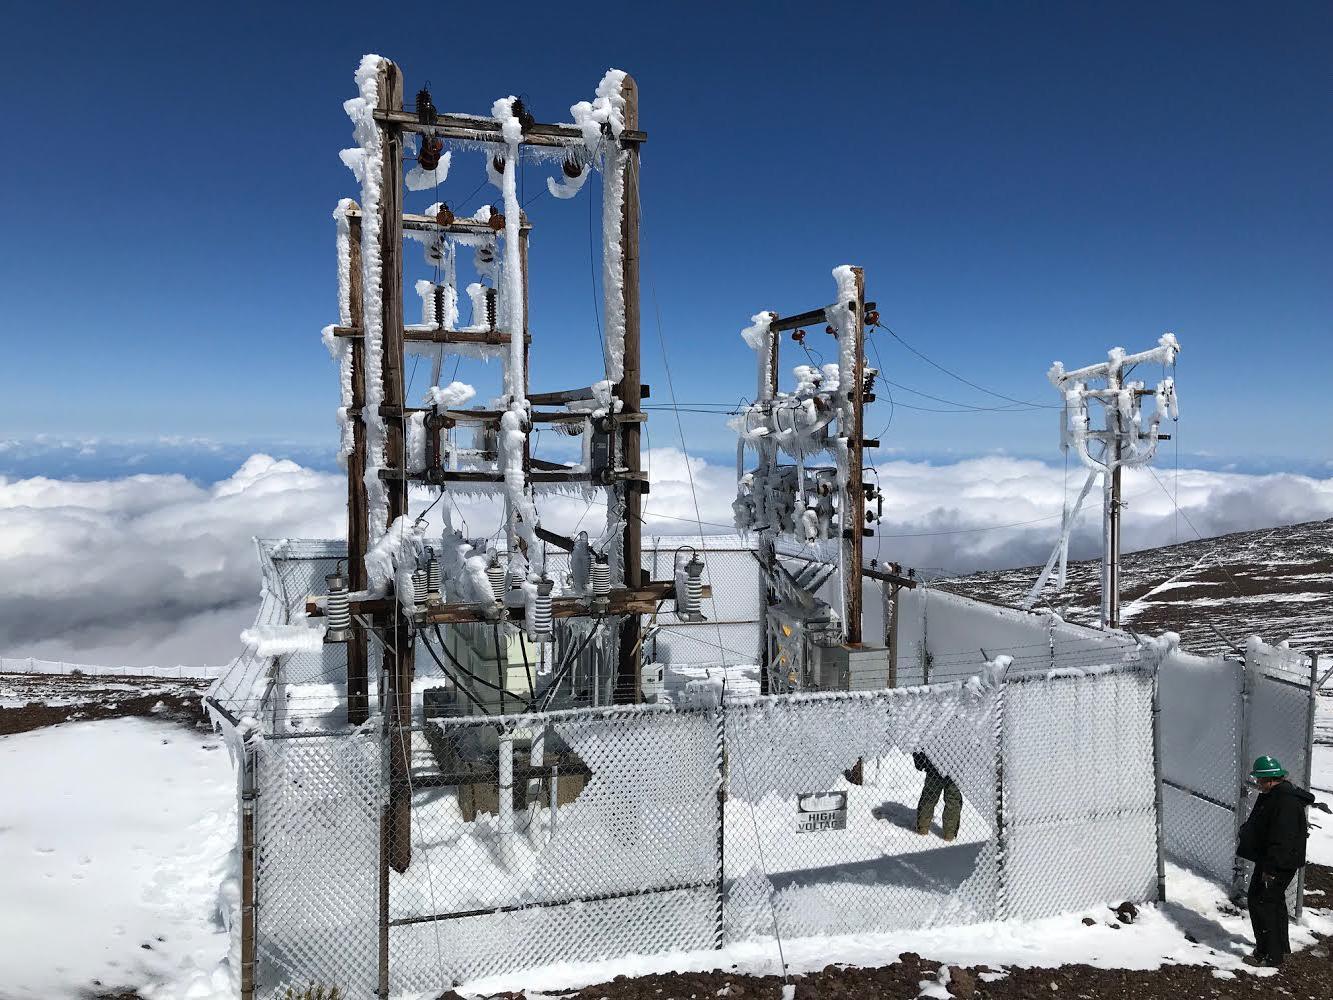 Haleakalā Remains Closed, Winter Weather Warning Issued